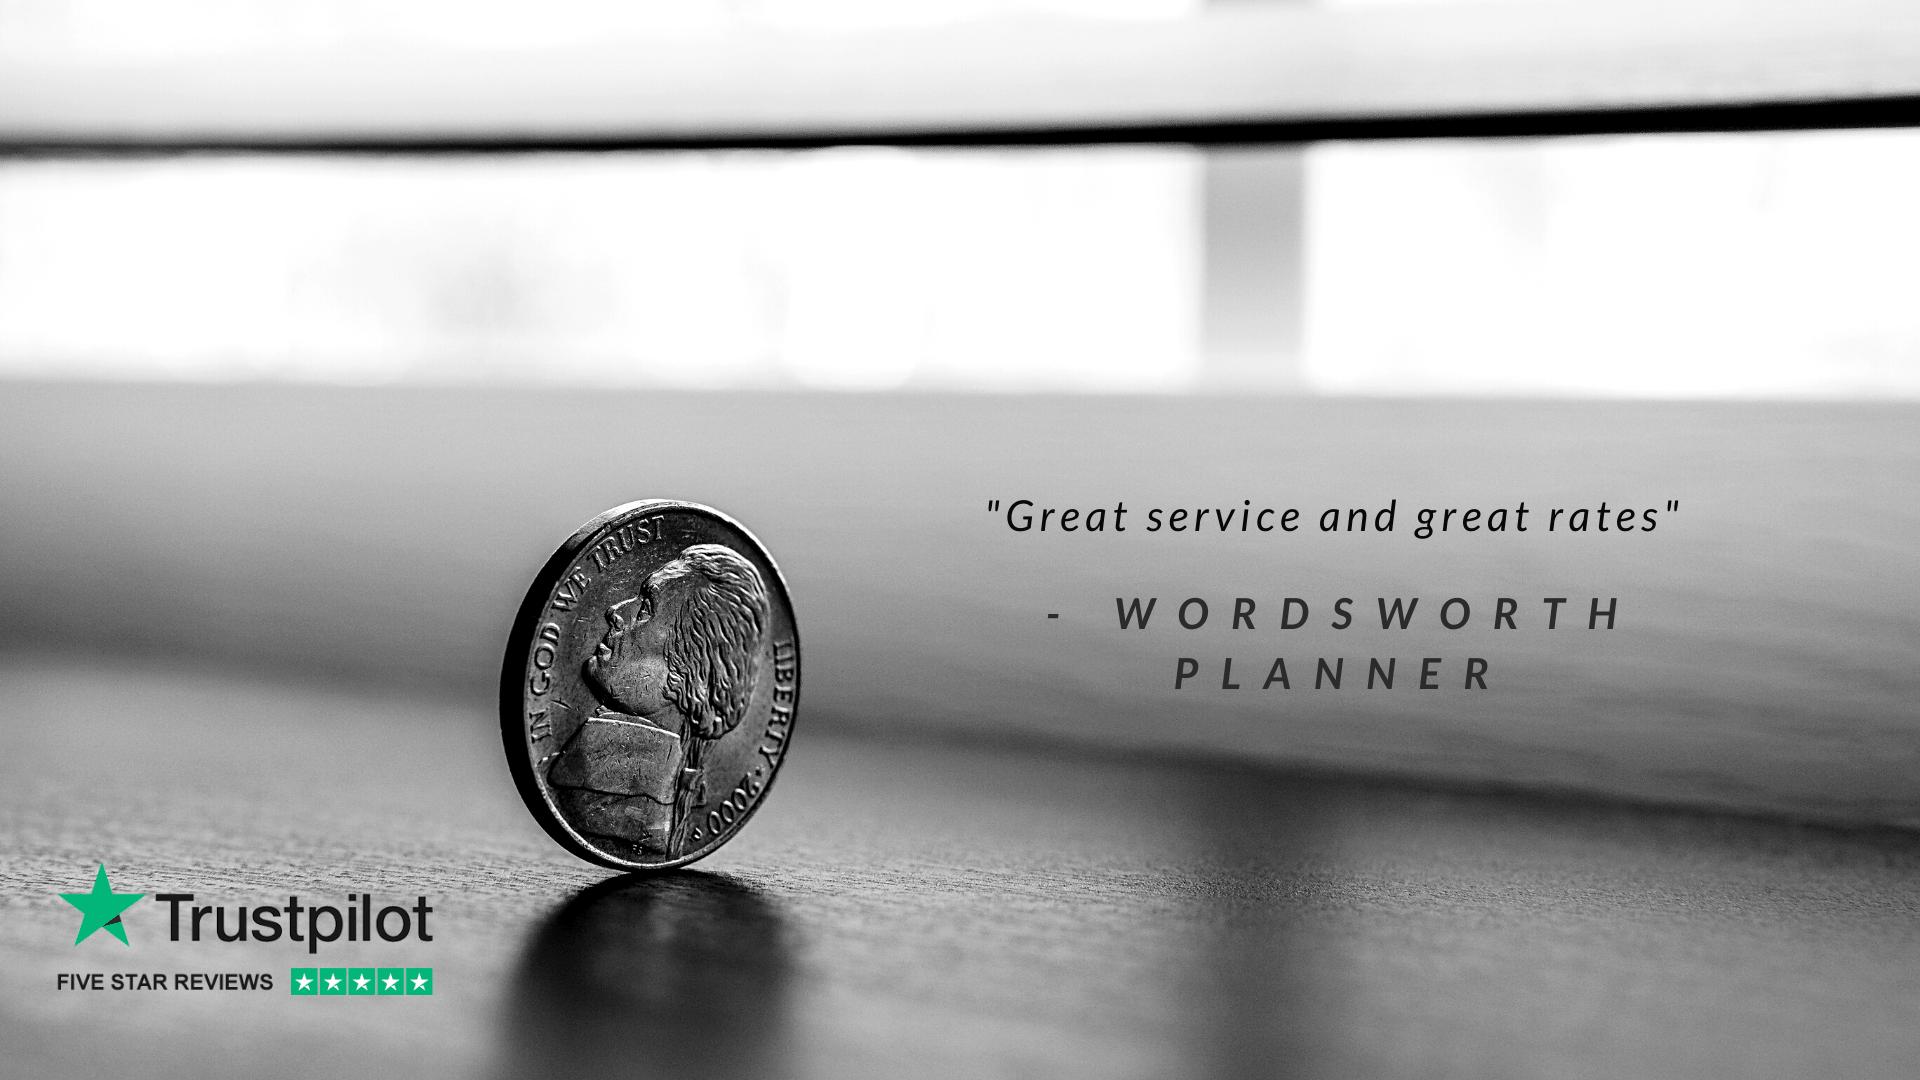 Wordsworth Planner